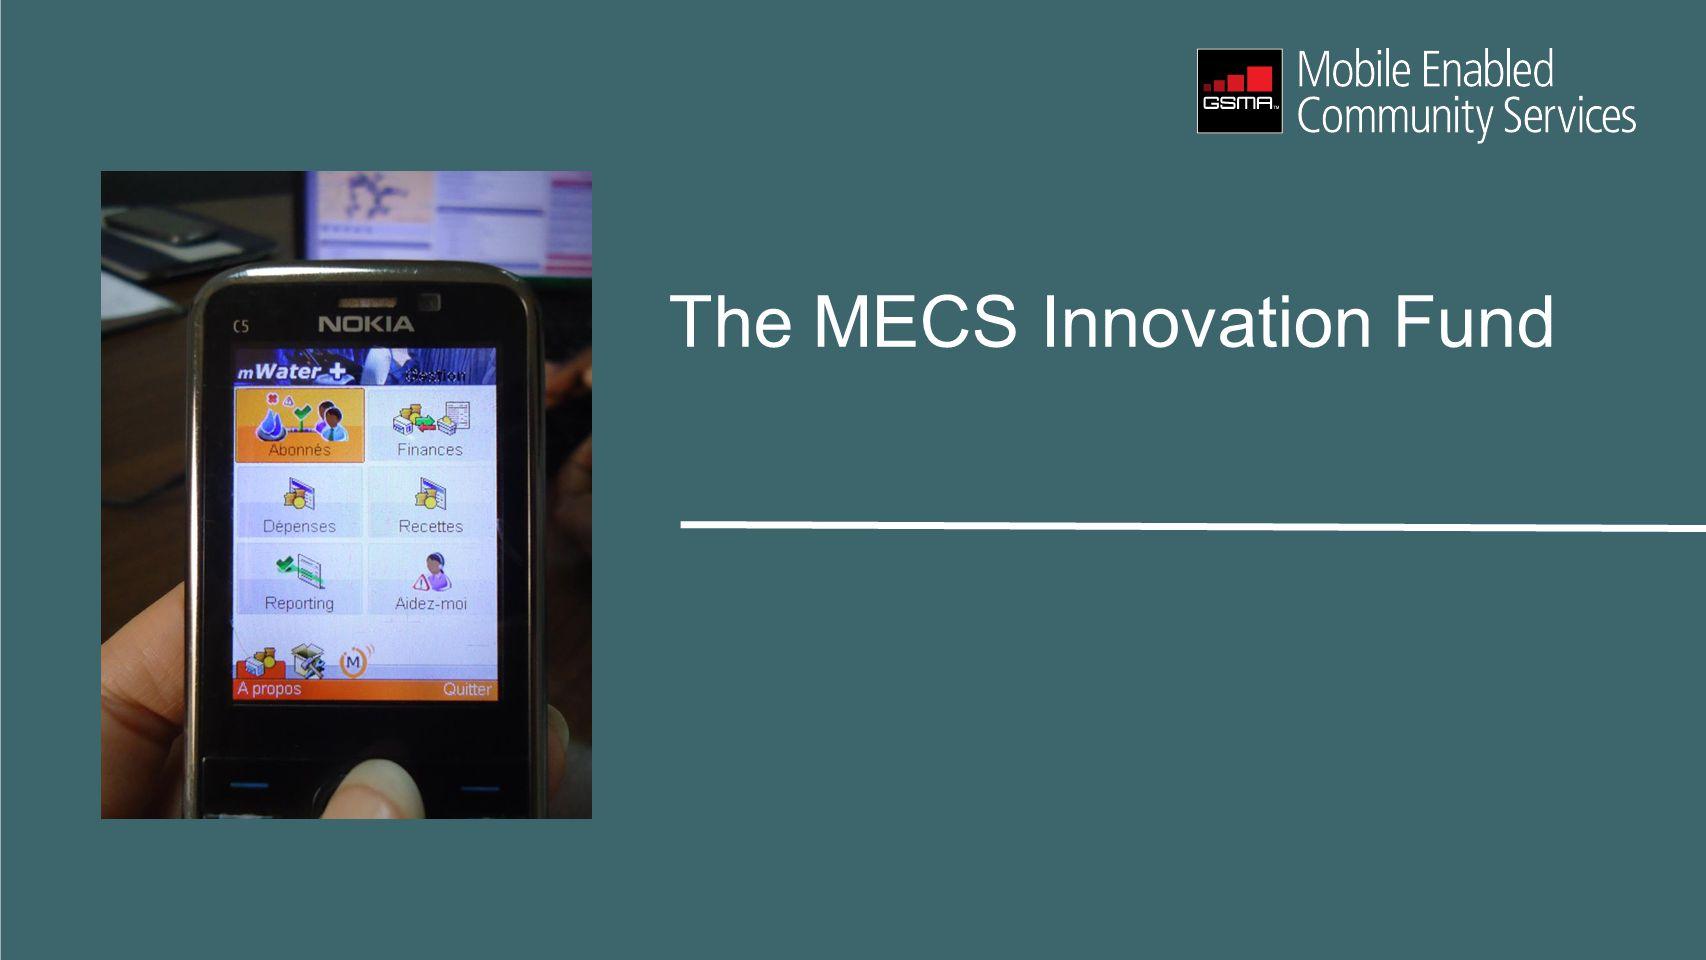 The MECS Innovation Fund